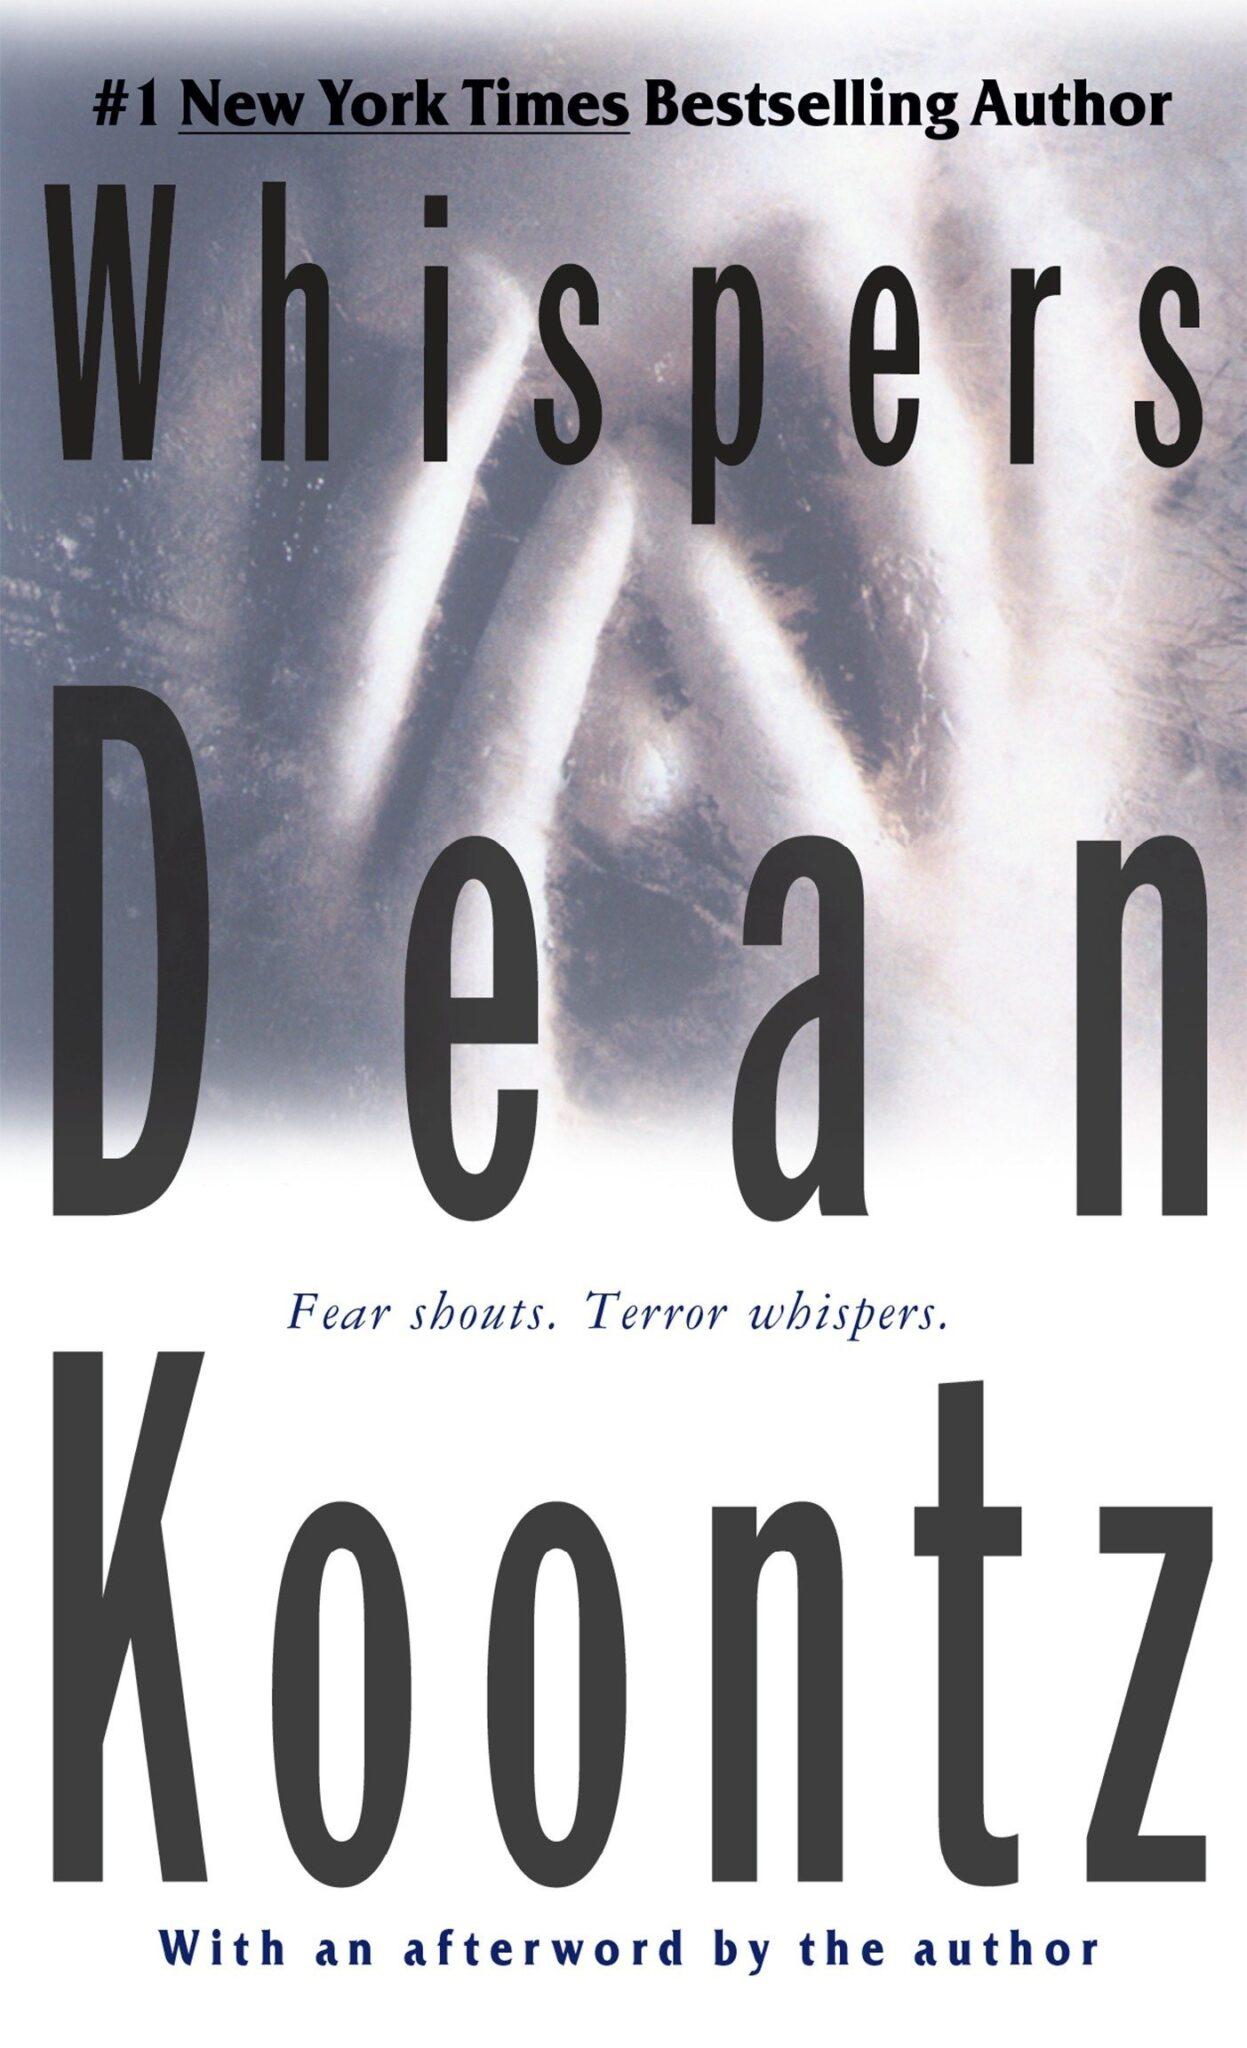 Dean Koontz books 22